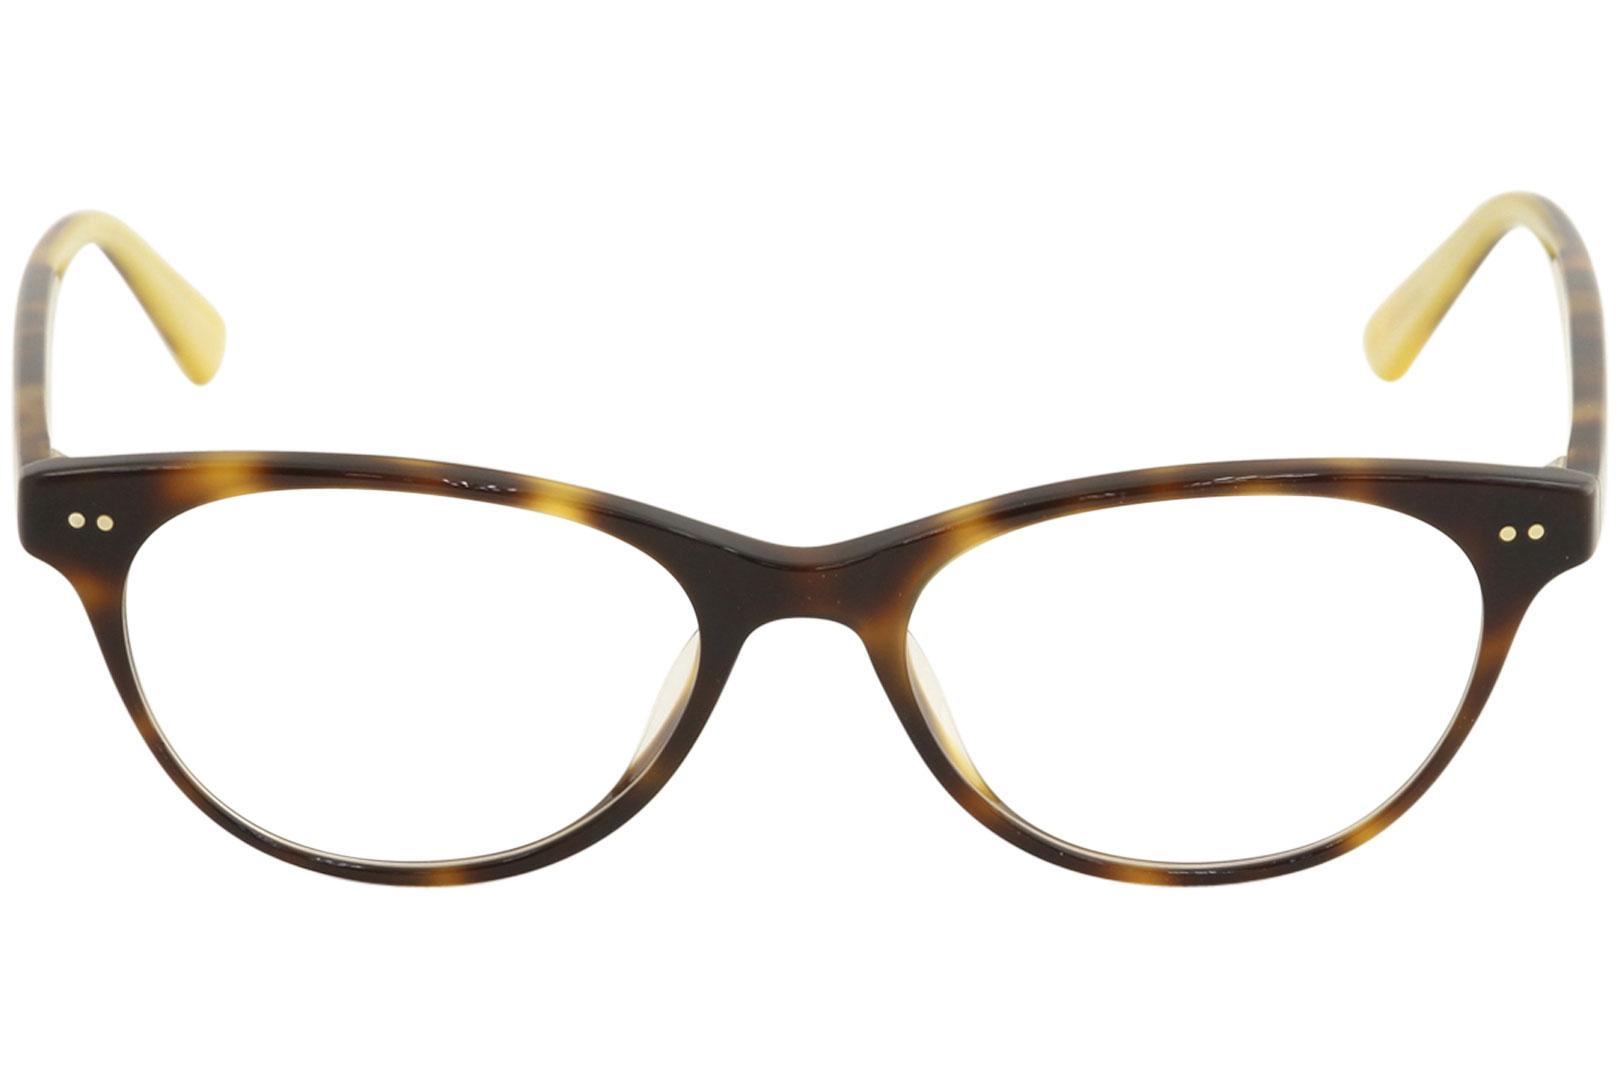 49f84280f9ef80 Etnia Barcelona Women s Eyeglasses Vintage Collection Florentin 17 ...